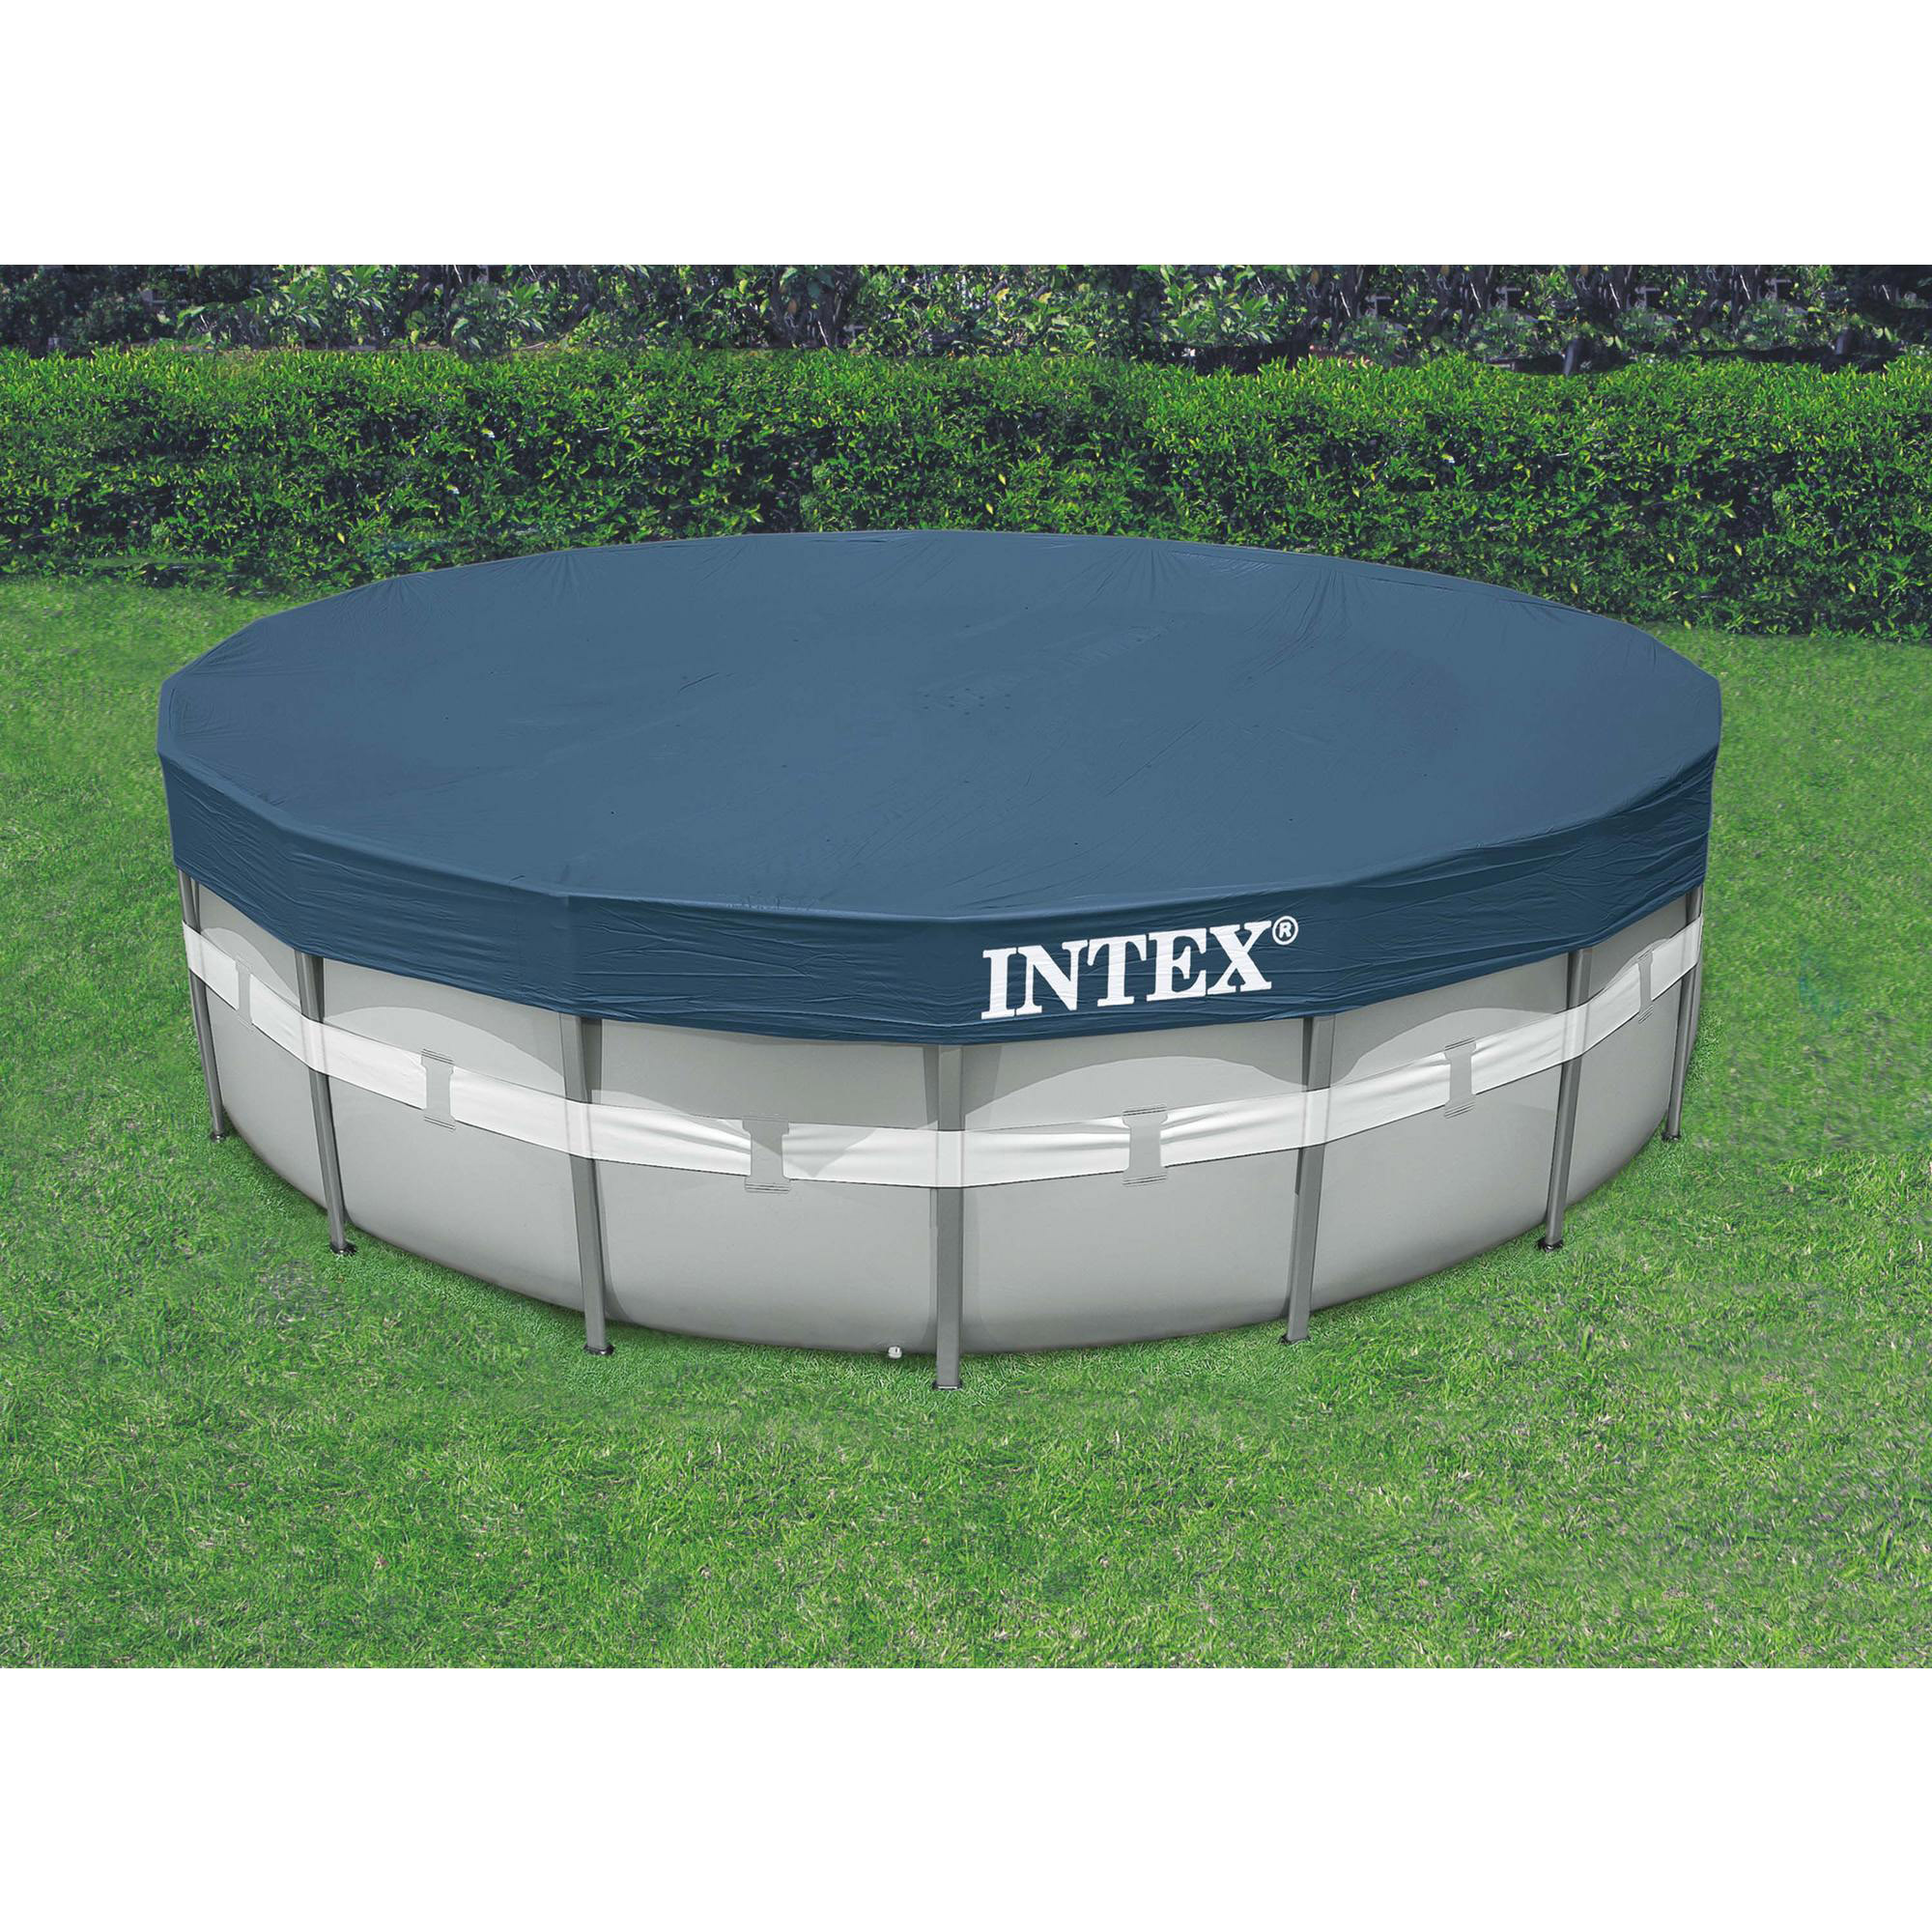 Intex 20 39 X 48 Ultra Frame Above Ground Swimming Pool Set W Pump And Ladder Ebay